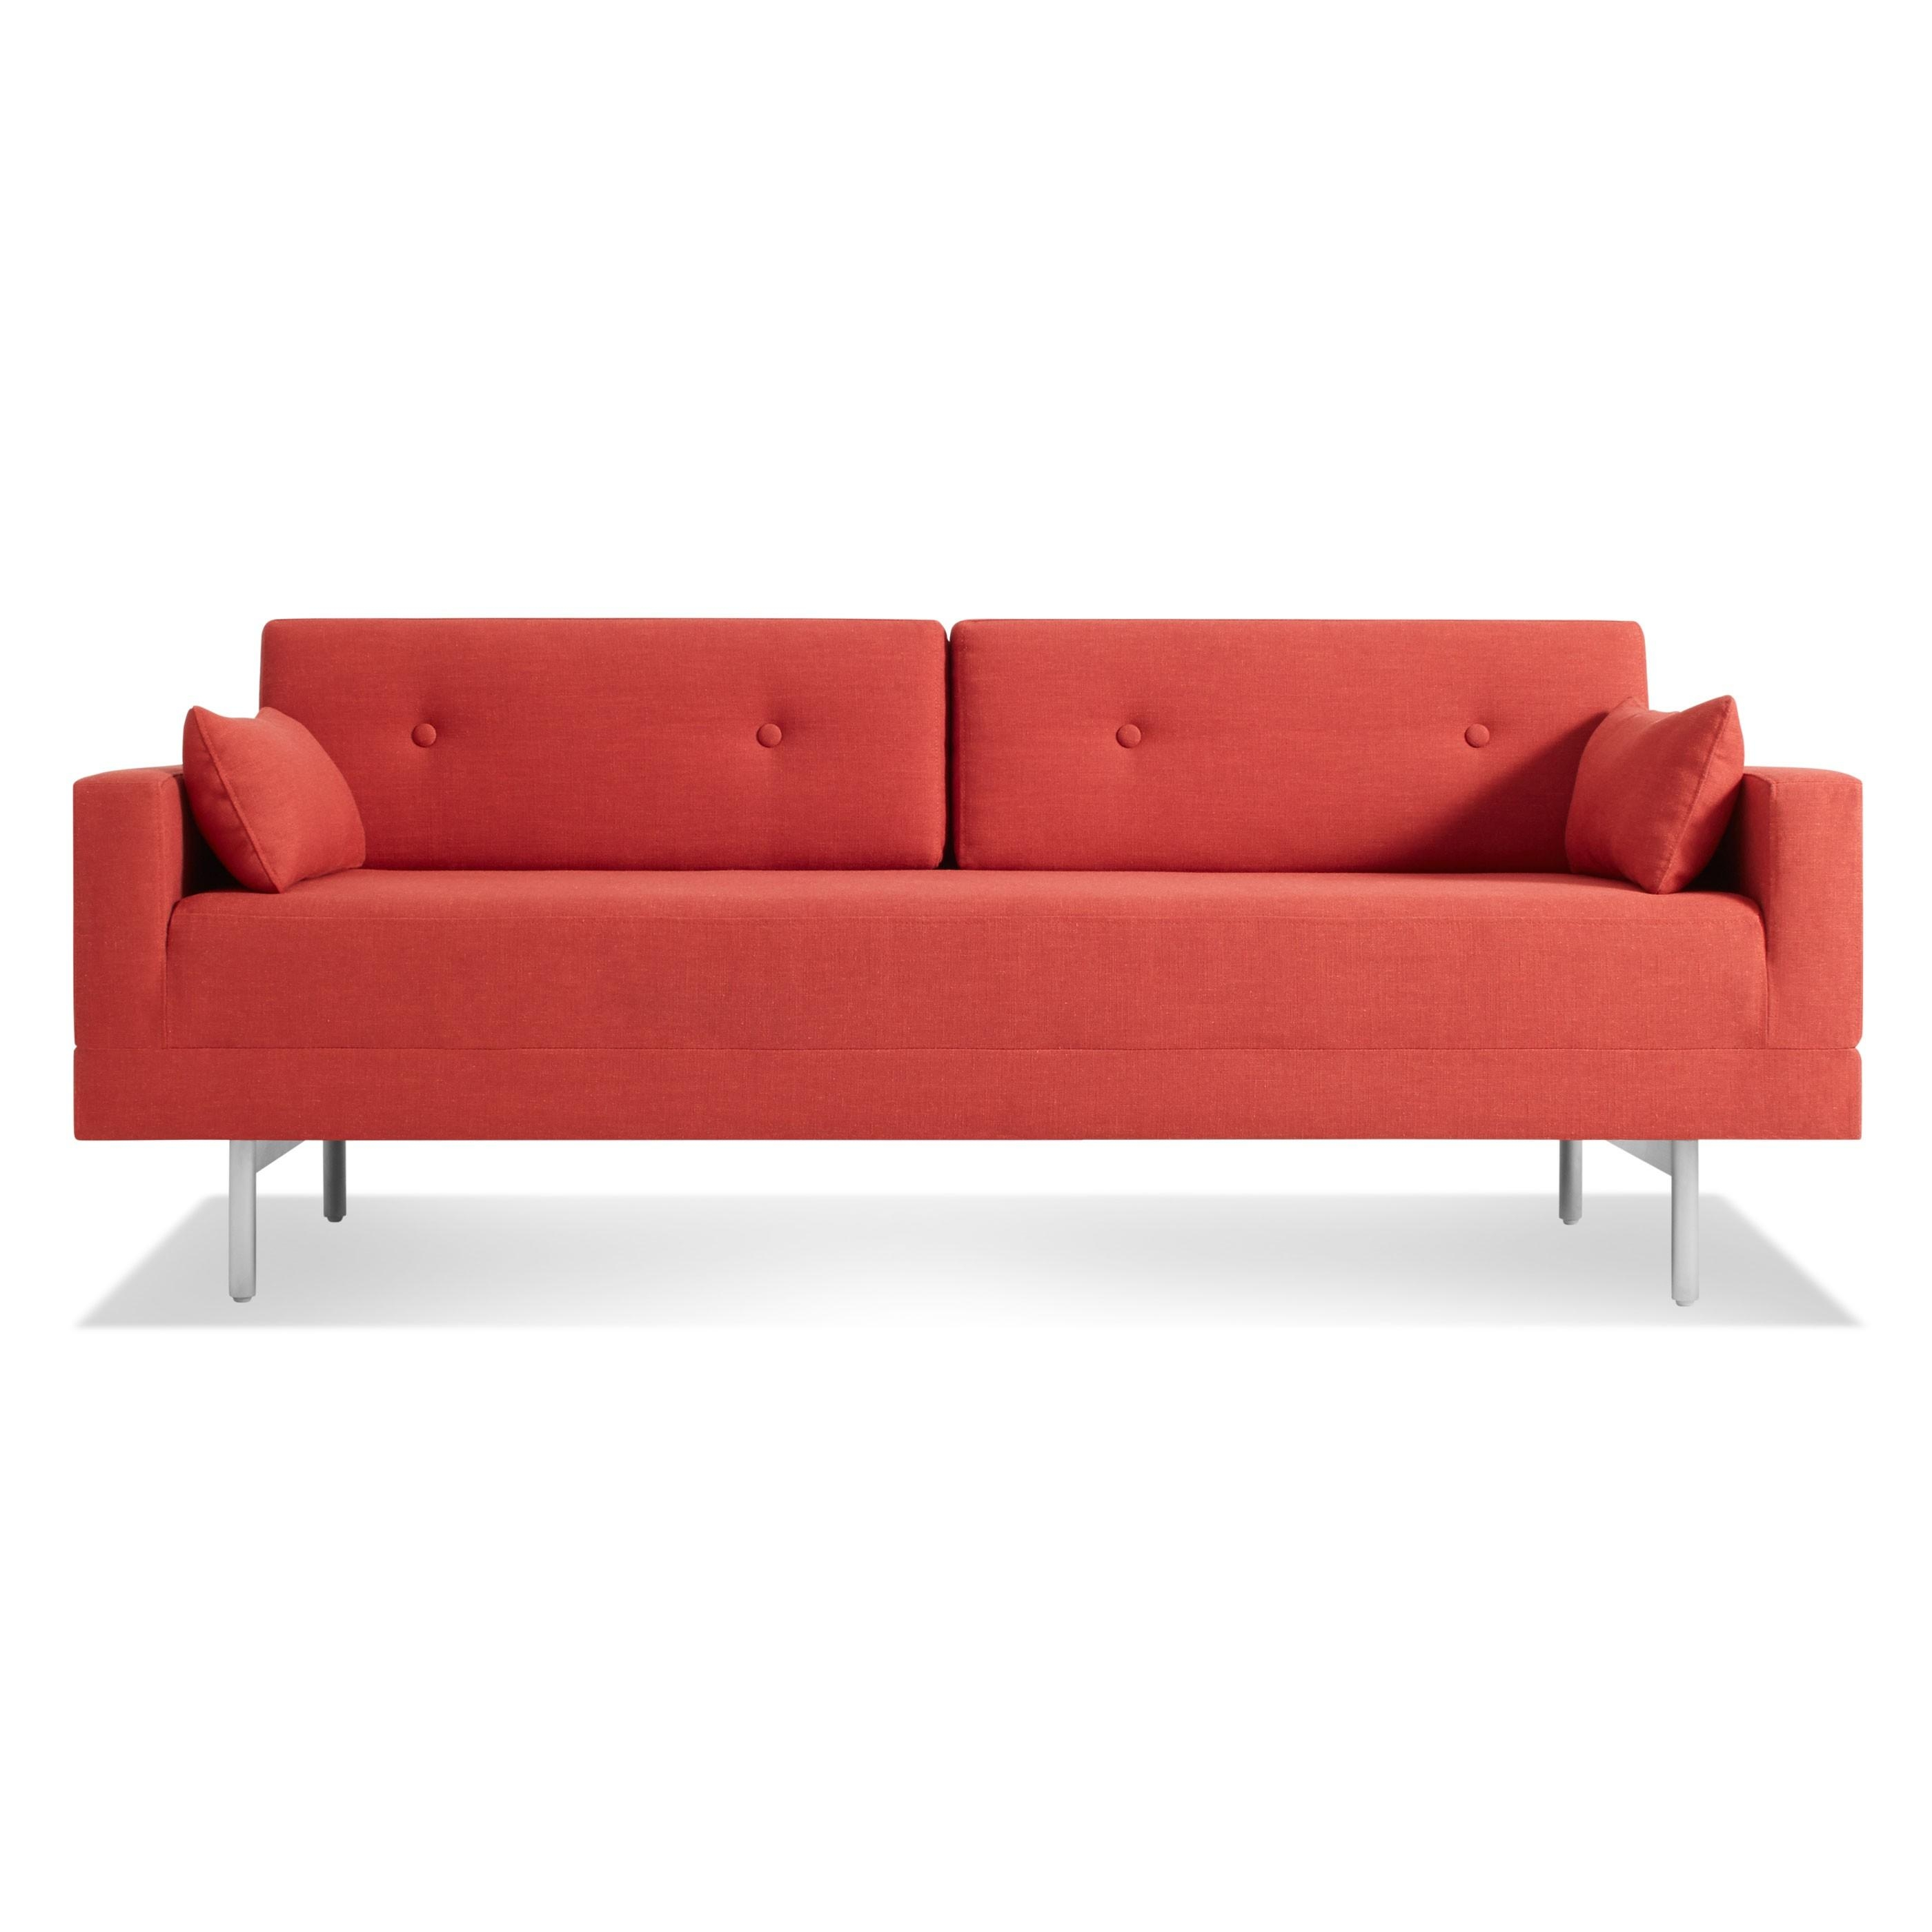 Sleeper Sofa – Diplomat Convertible Sofa | Blu Dot Inside Slipper Sofas (Image 5 of 20)